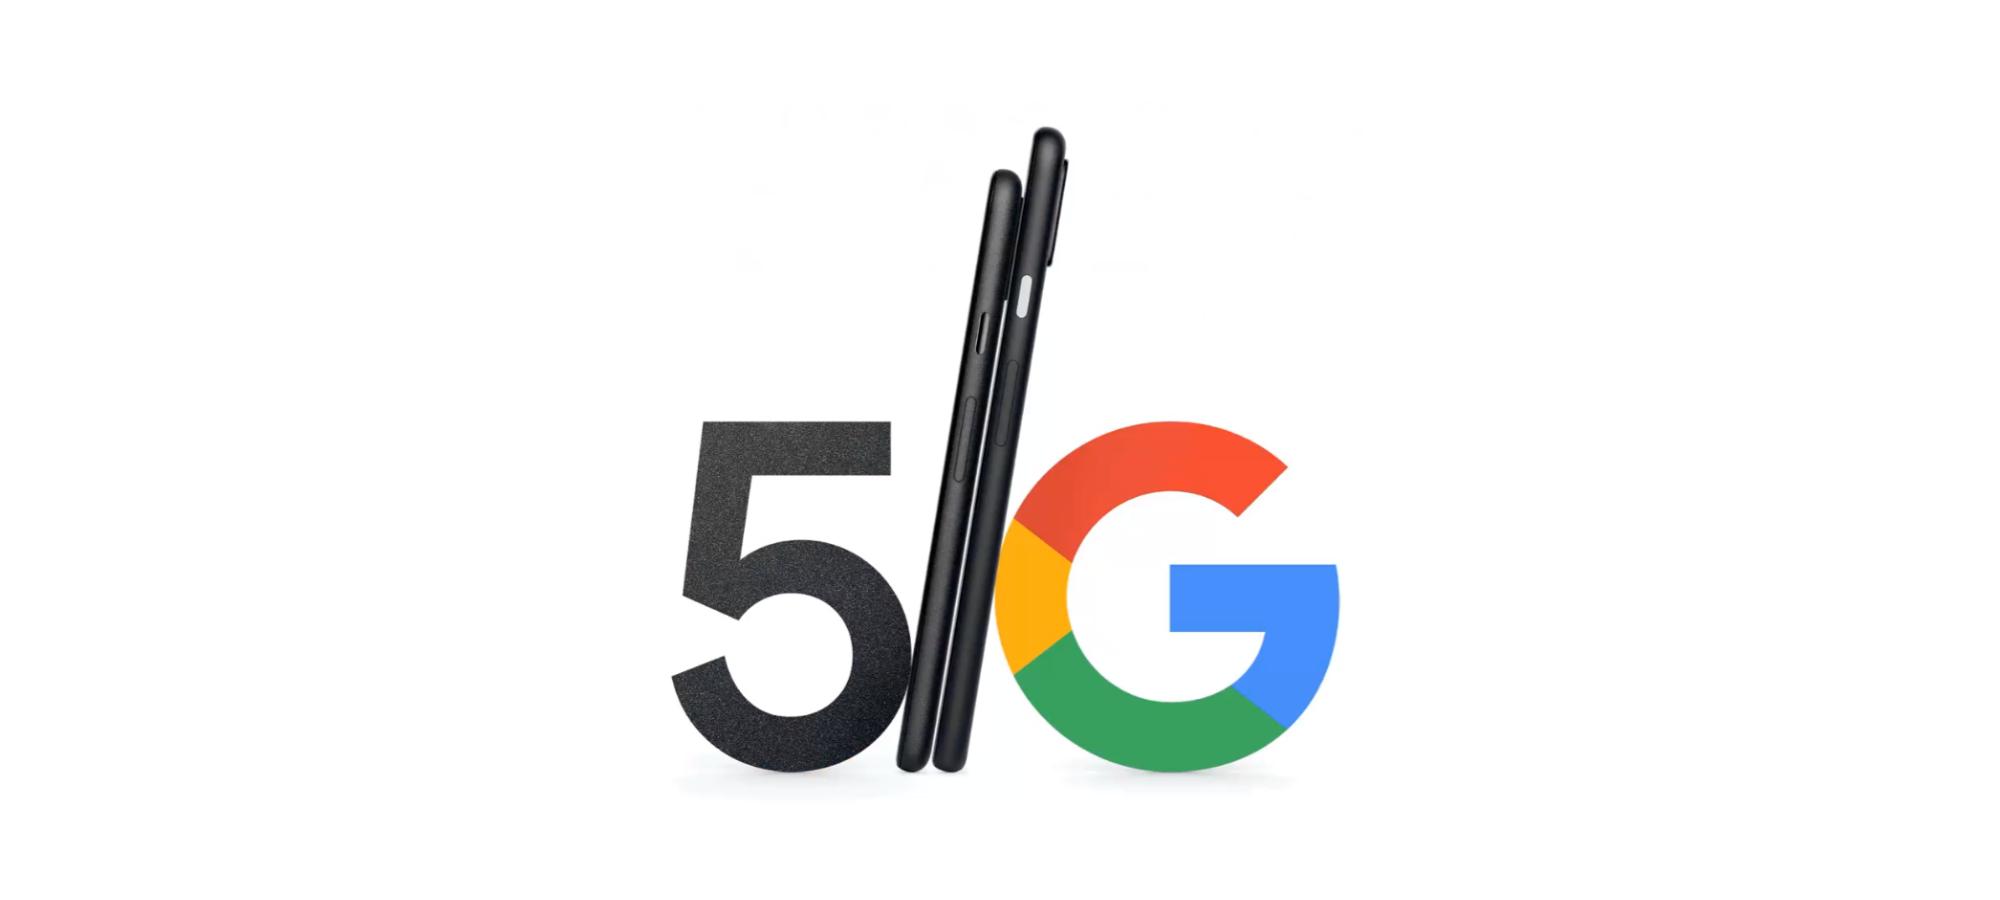 Google Pixel 5 and & Google pixel 4a